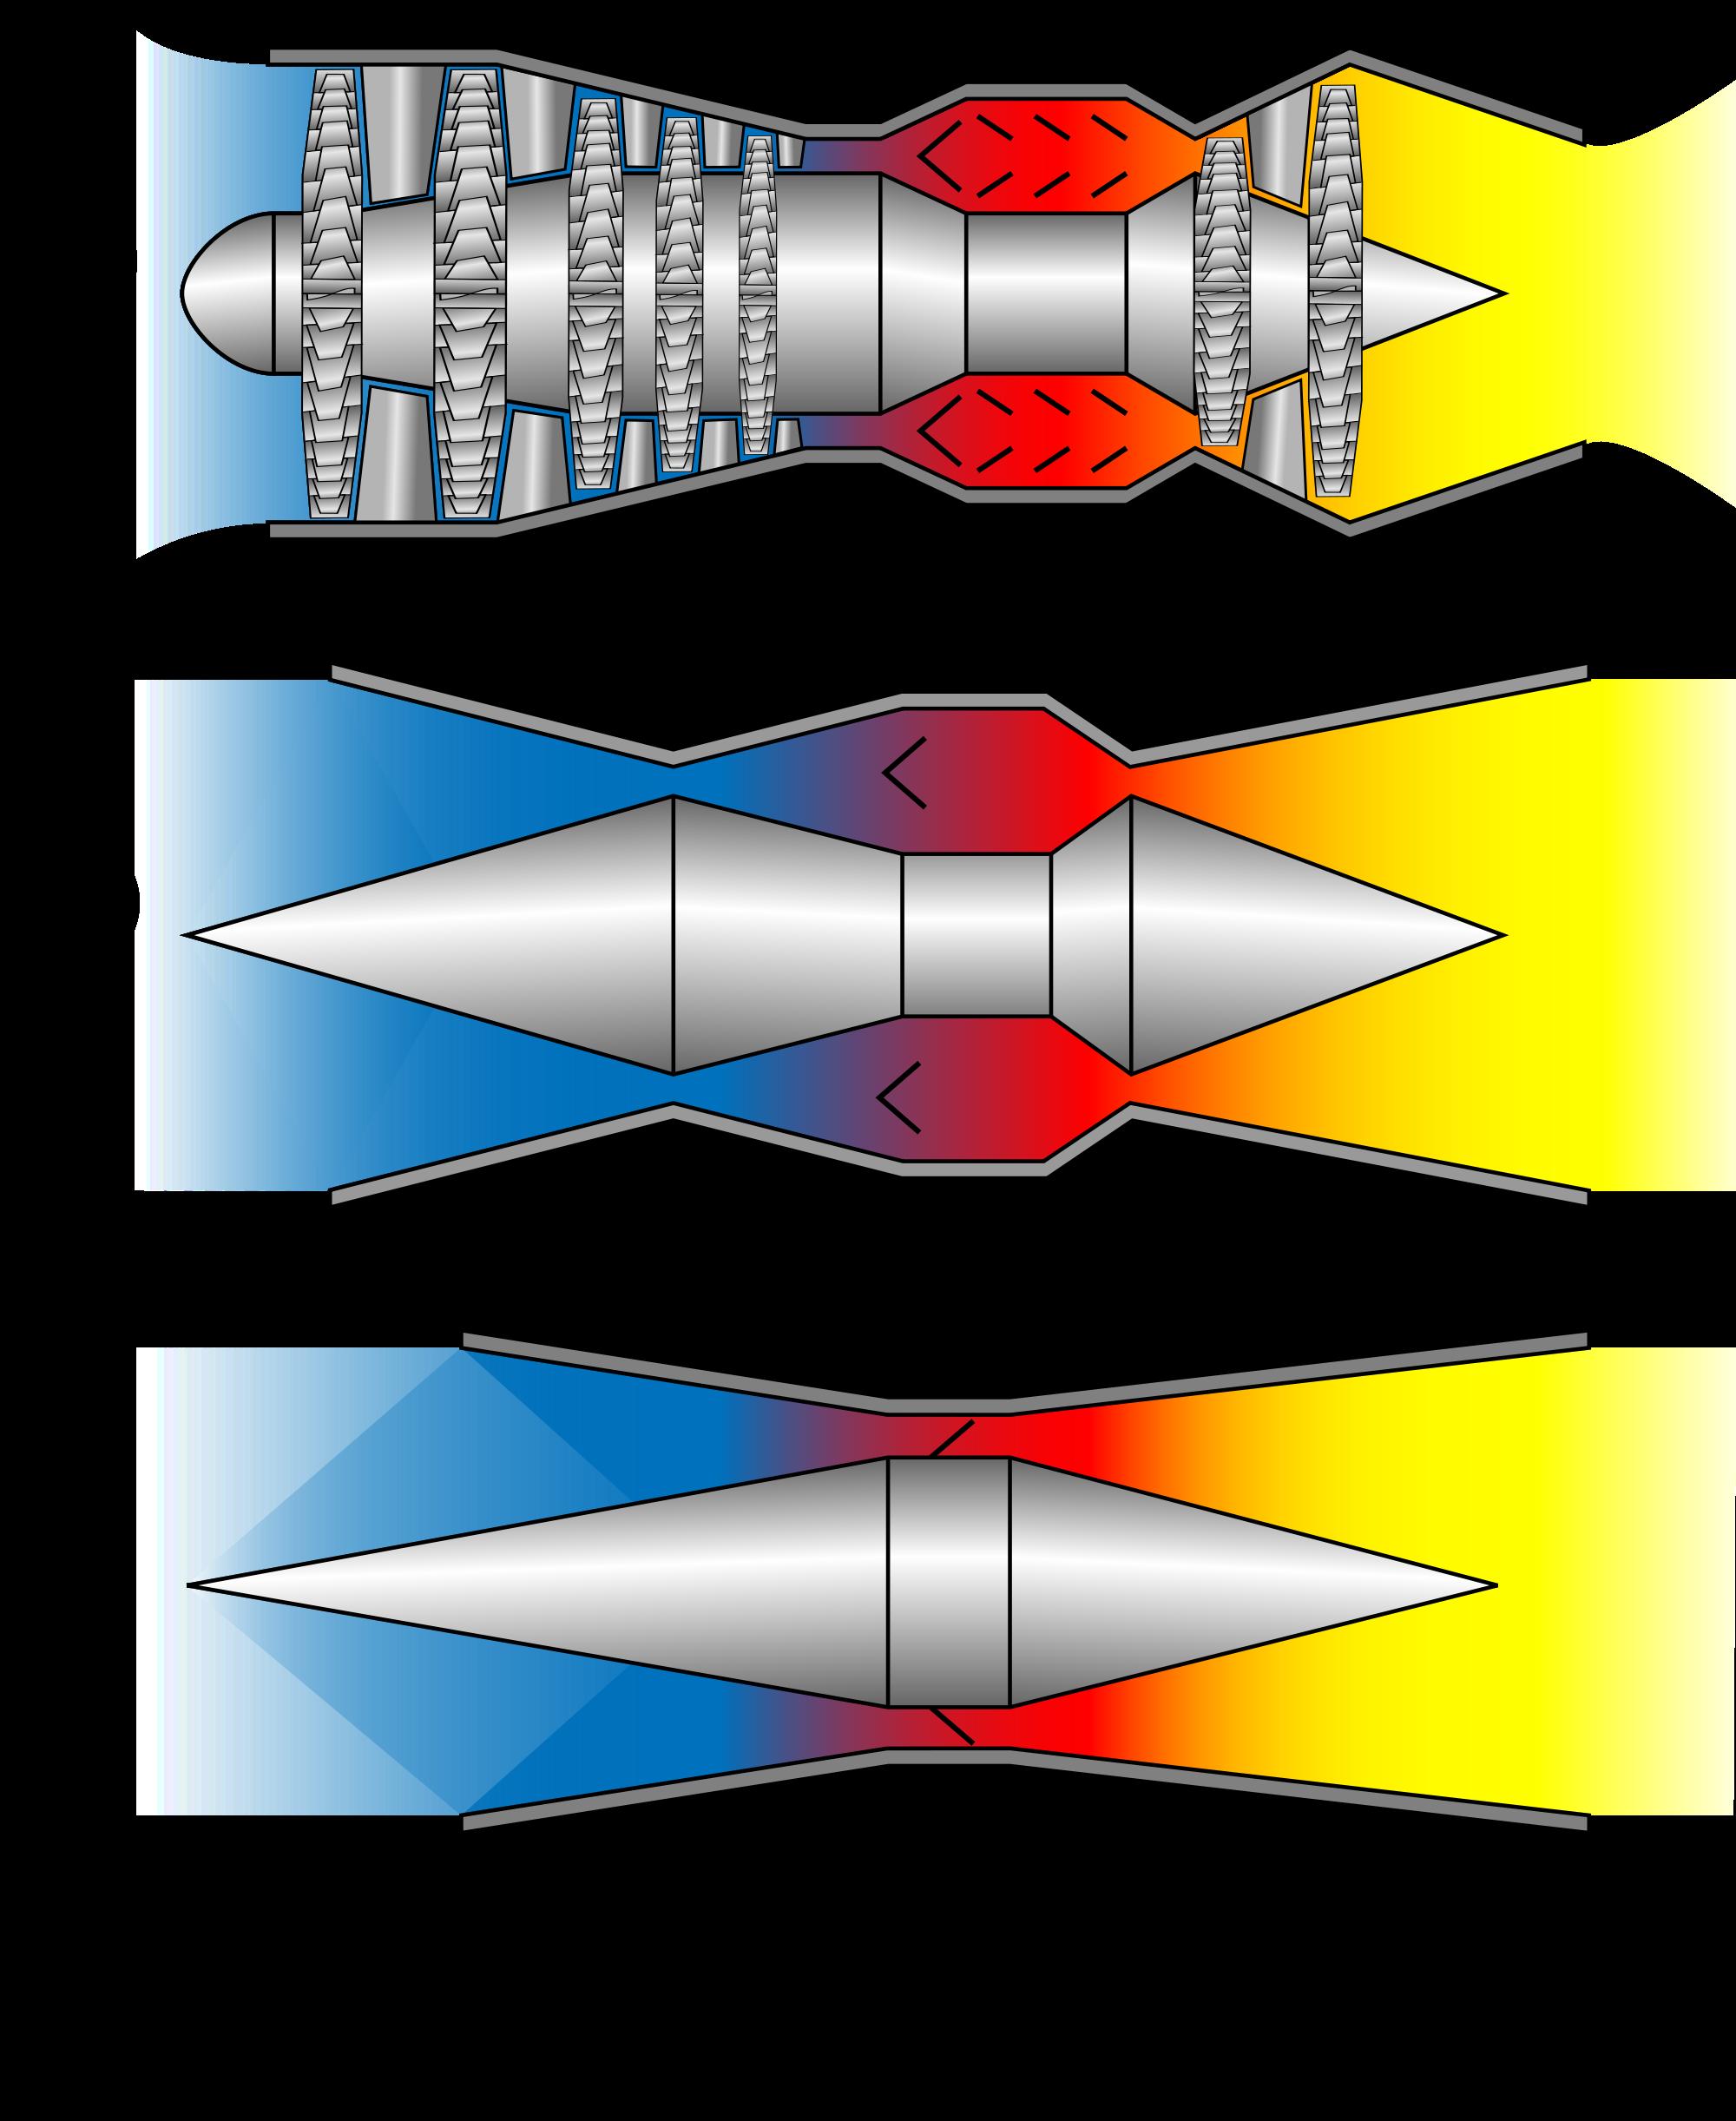 Scramjet Wikipedia The Free Encyclopedia Aircraft Space Functional Flow Block Diagram